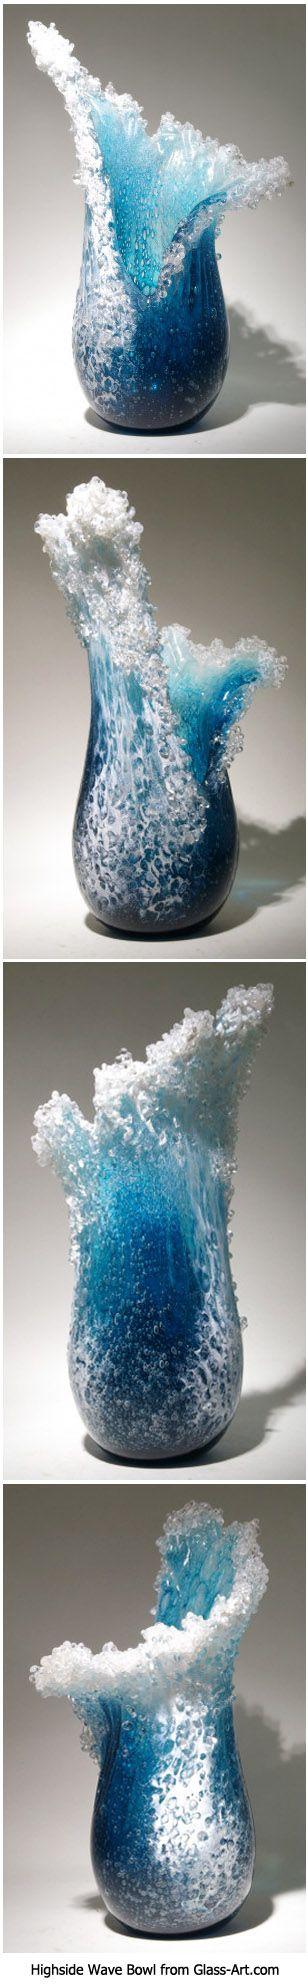 Highside Wave Bowl from http://www.glass-art.com/deso-Hiside-C.htm